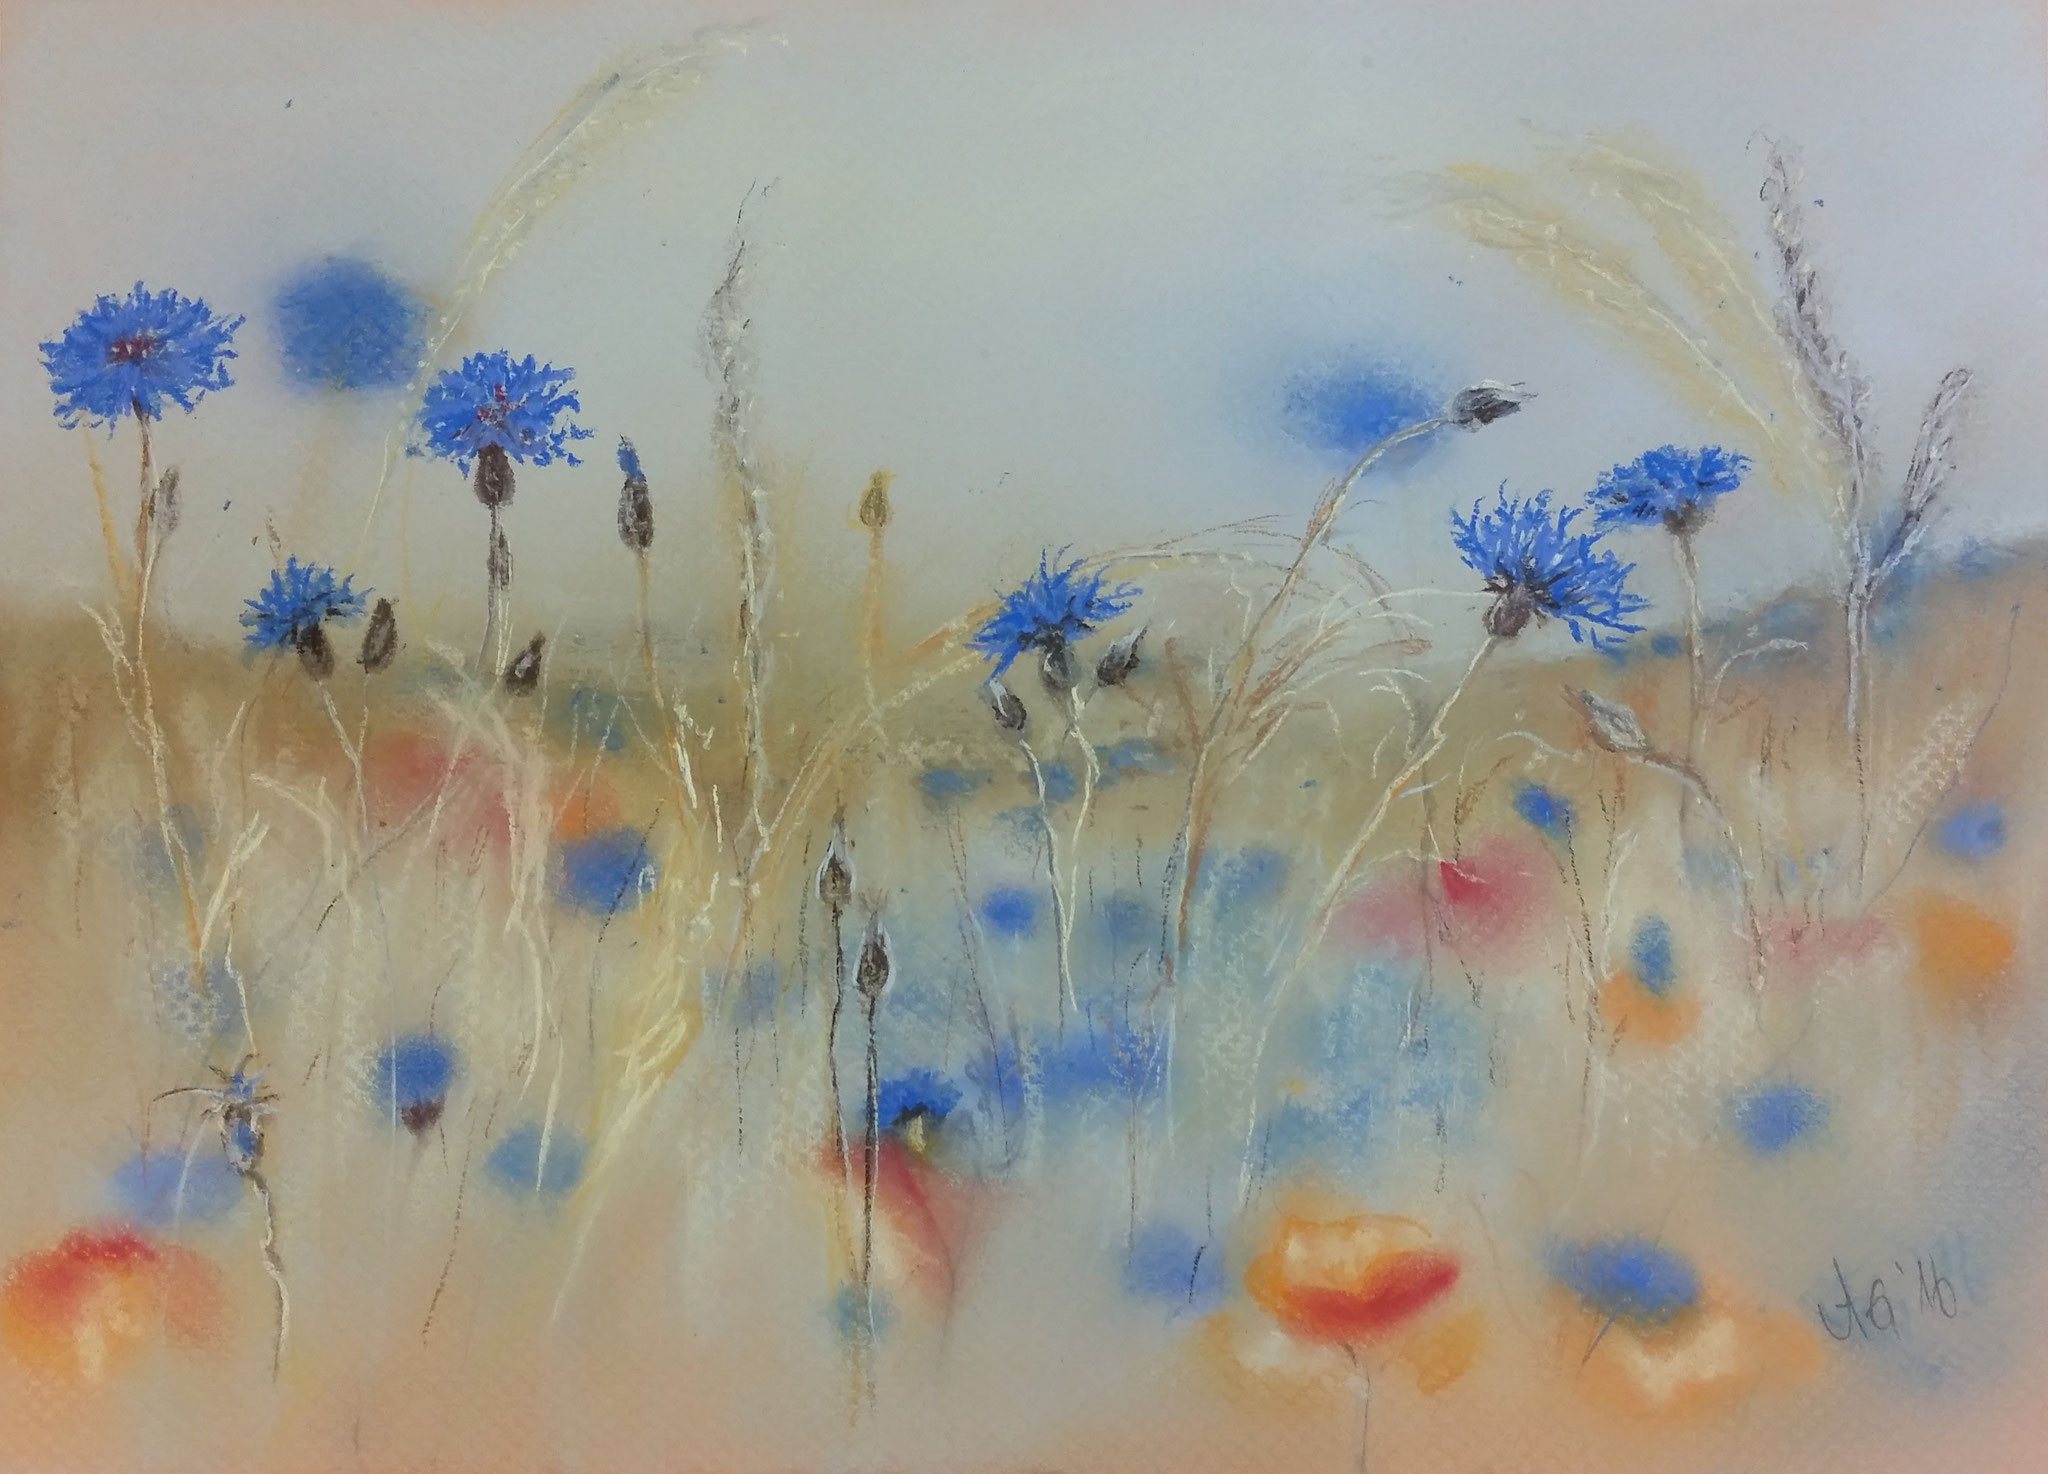 Sommertraum, 2017, Pastell 20*30 cm